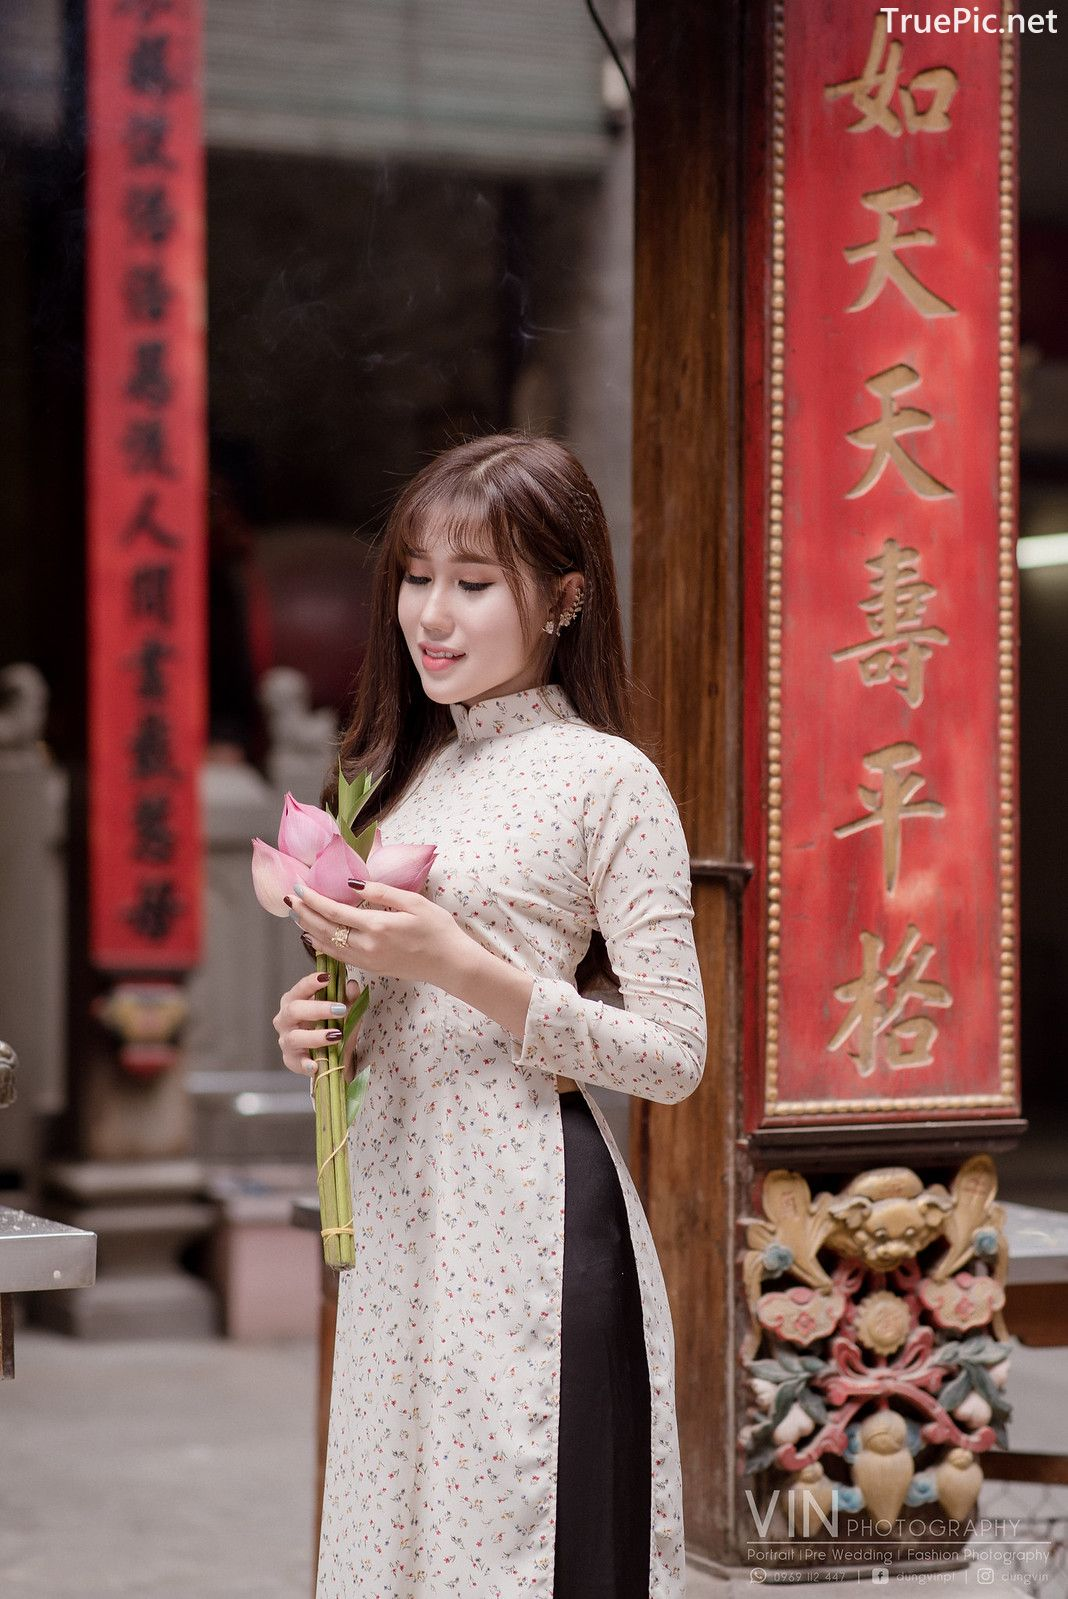 Image-Vietnamese-Beautiful-Girl-Ao-Dai-Vietnam-Traditional-Dress-by-VIN-Photo-2-TruePic.net- Picture-8